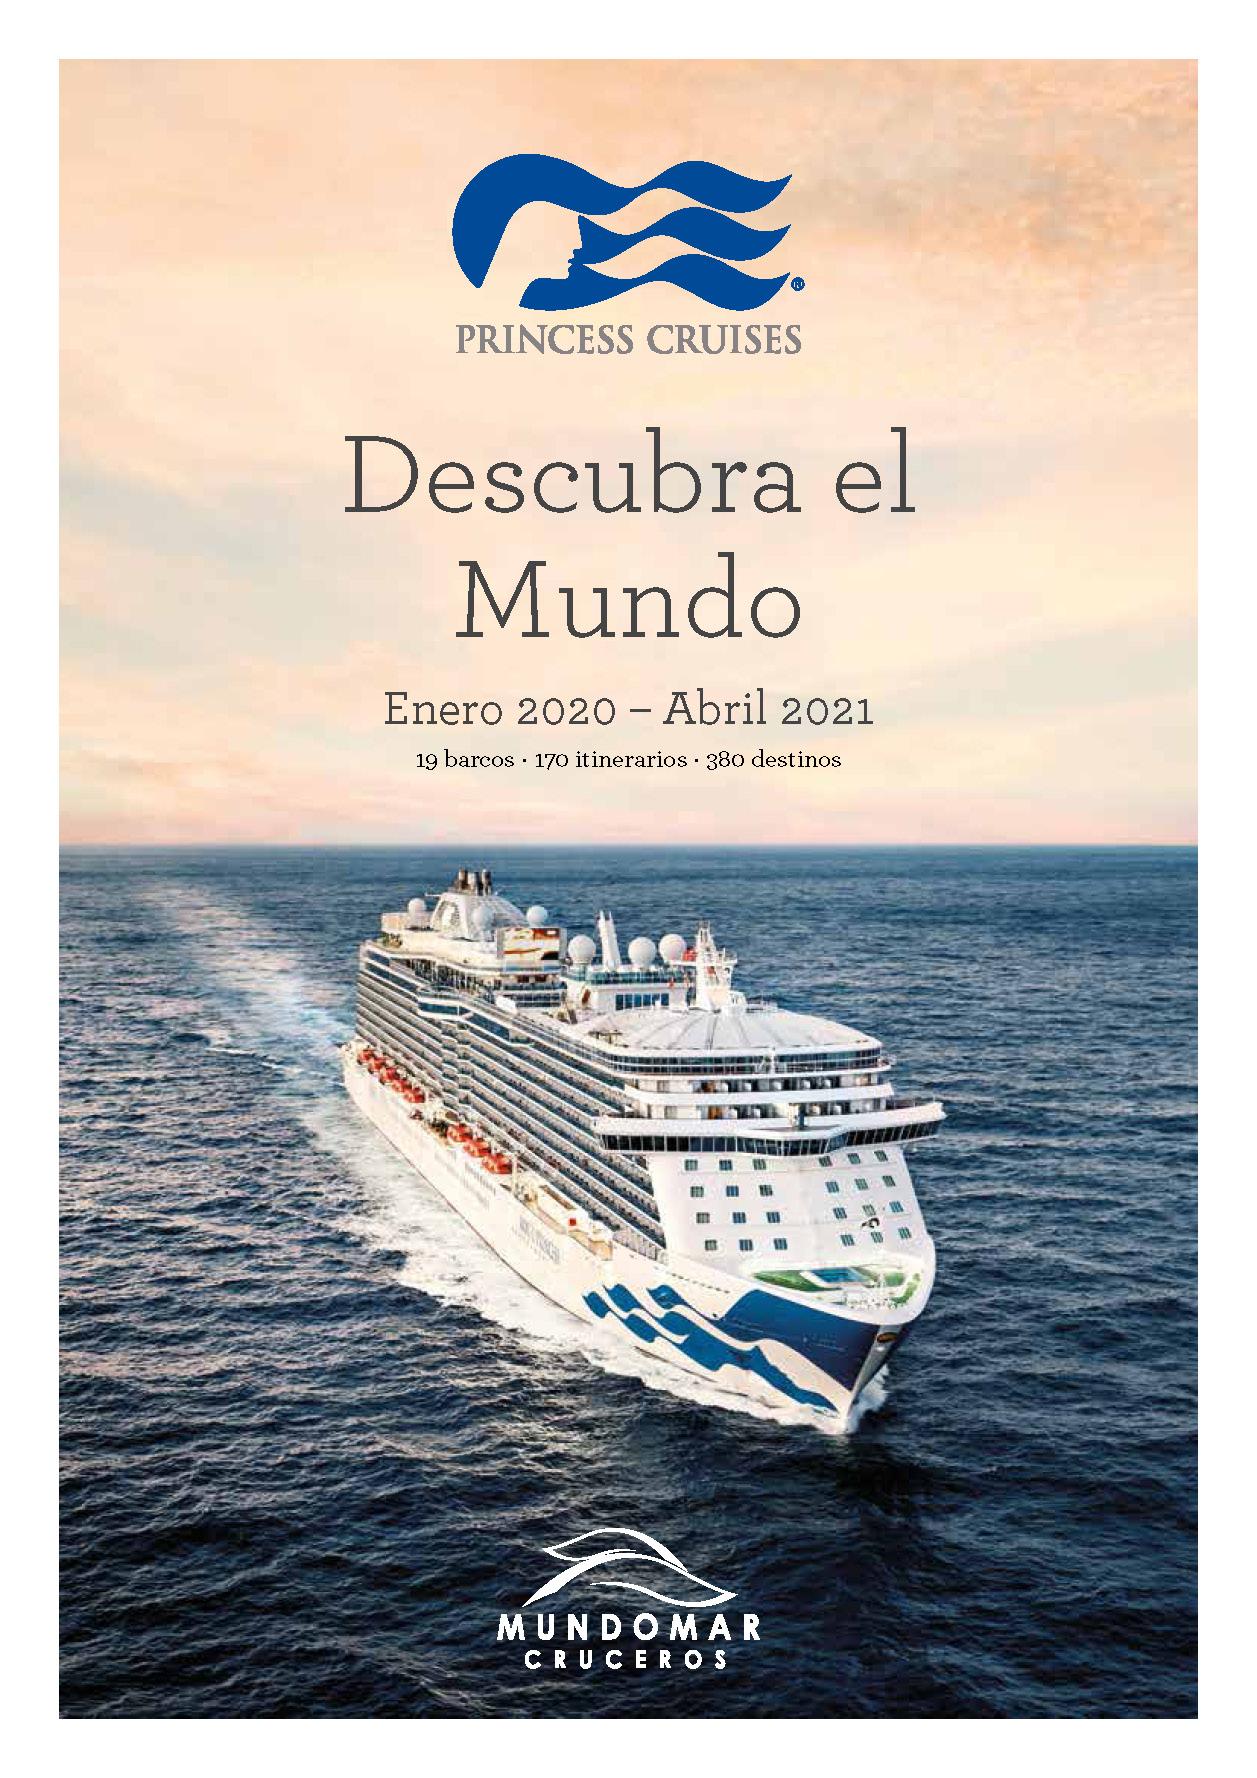 Catalogo Princess Cruises 2020-2021